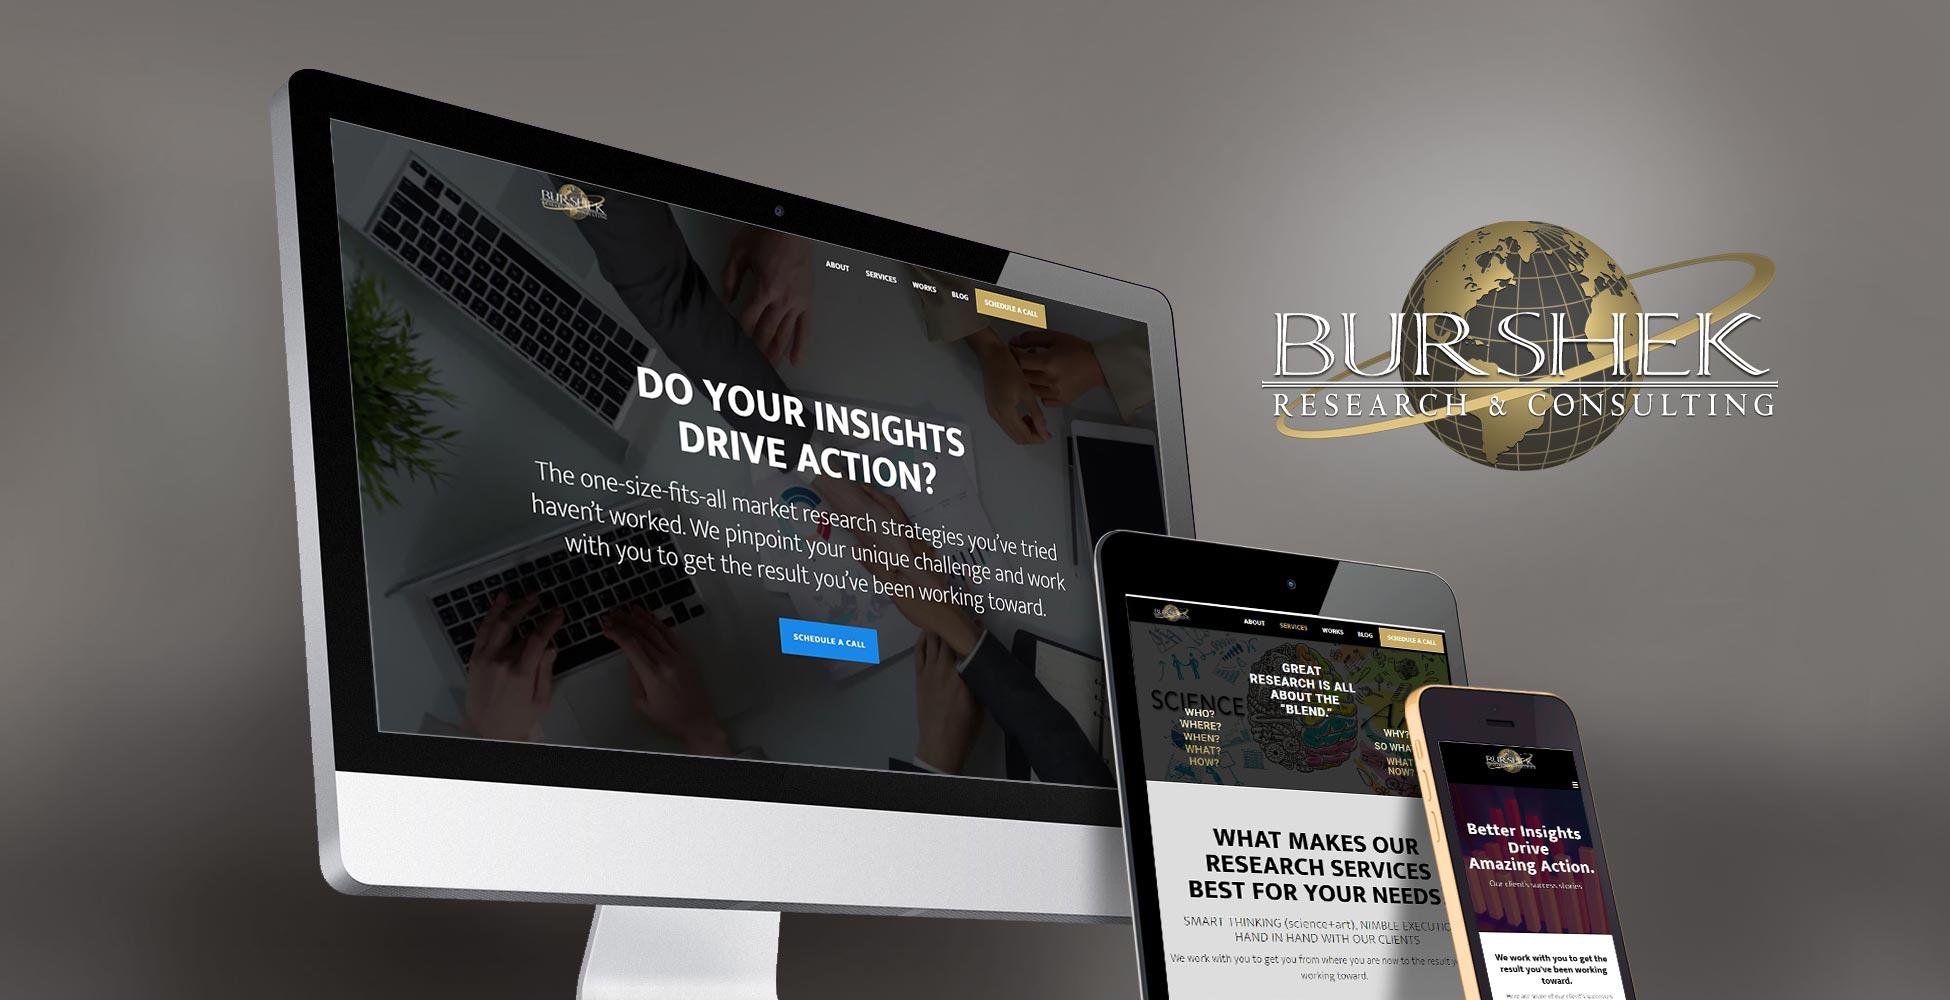 works_burshek-research